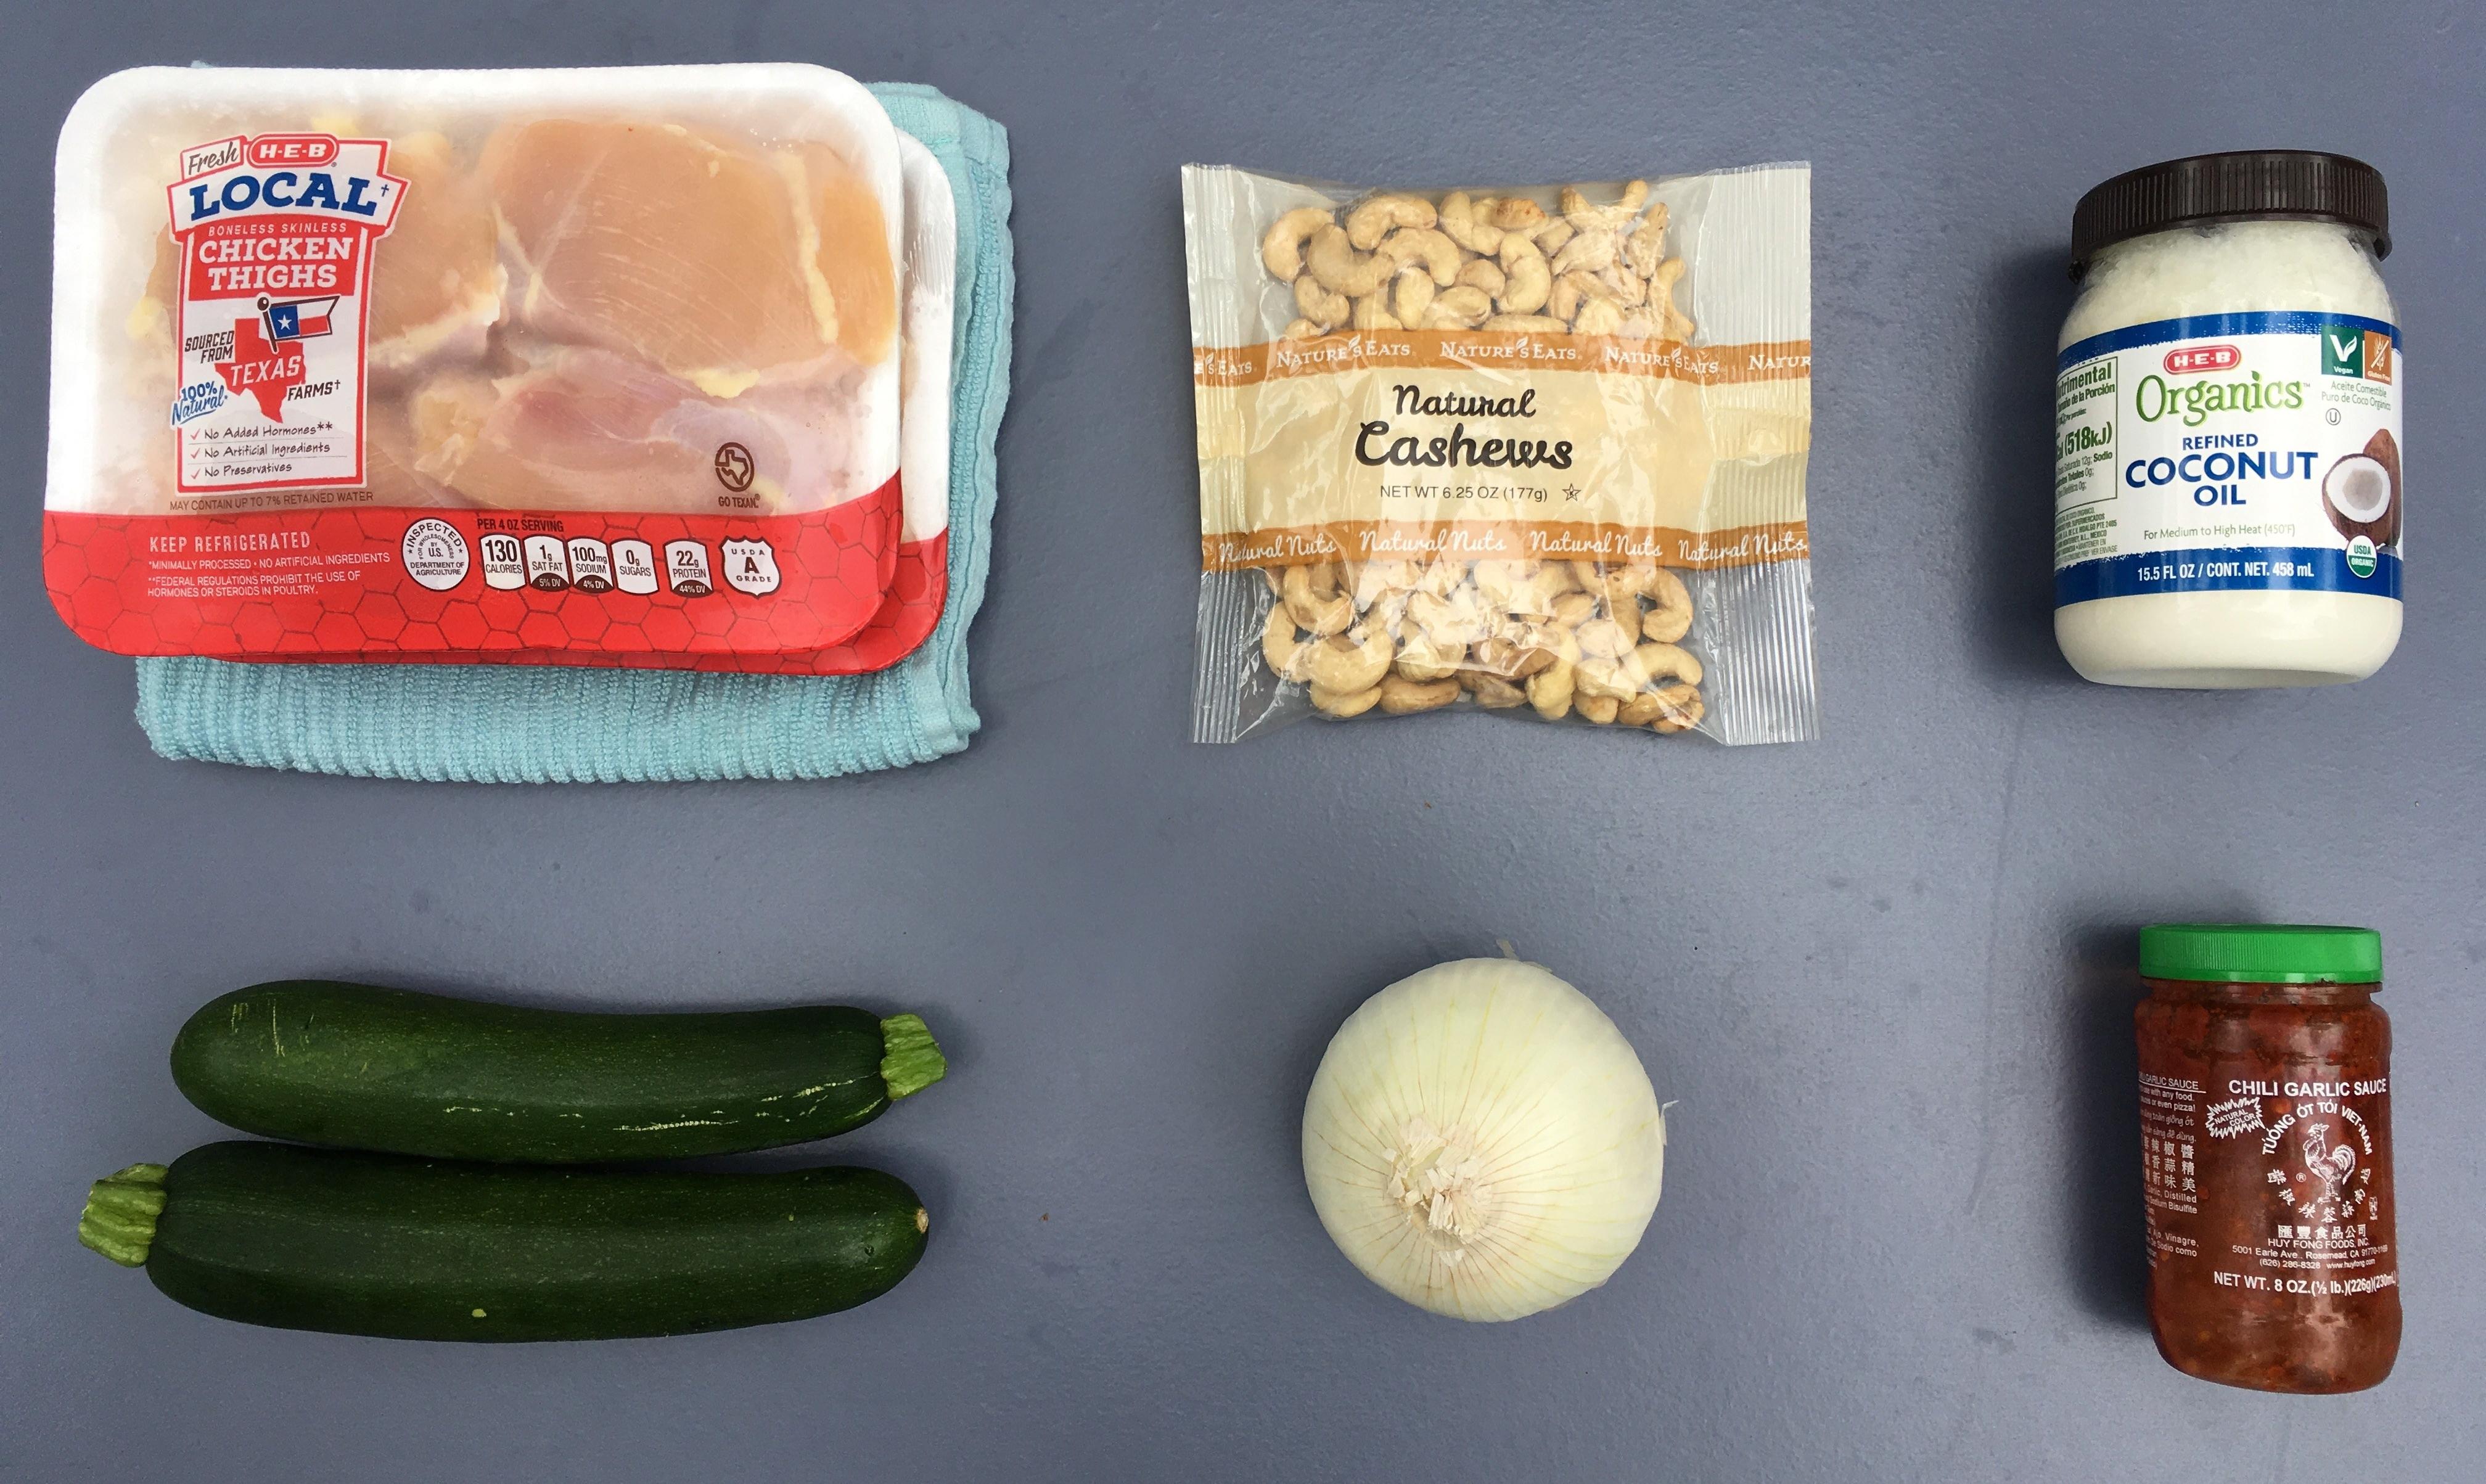 Low Carb Chicken Stir Fry - Ingredients